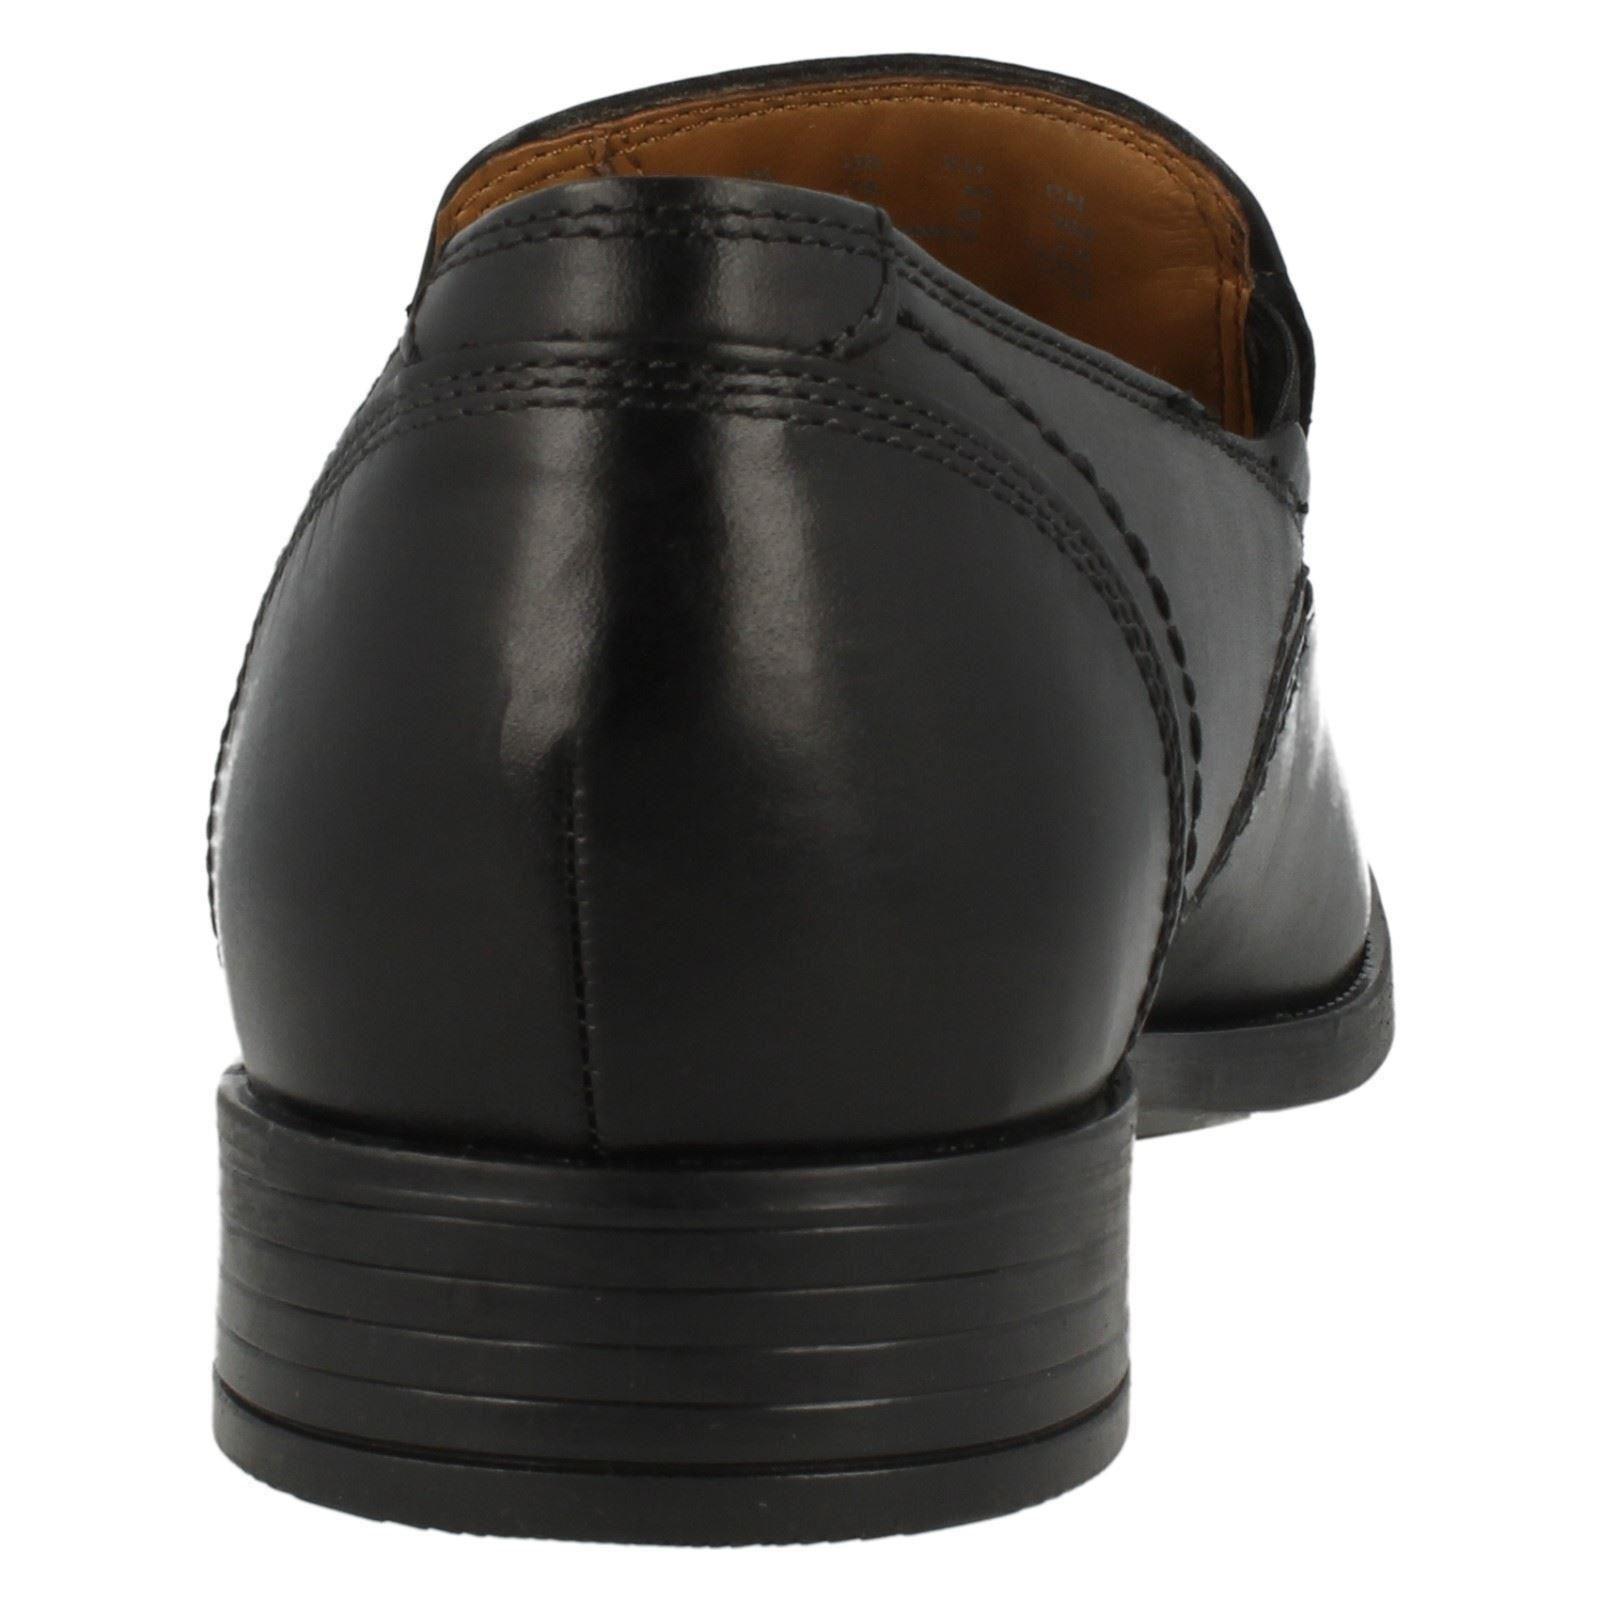 Billig Vibe hohe Qualität Clarks Kalden Vibe Billig Schnürschuhe c87210